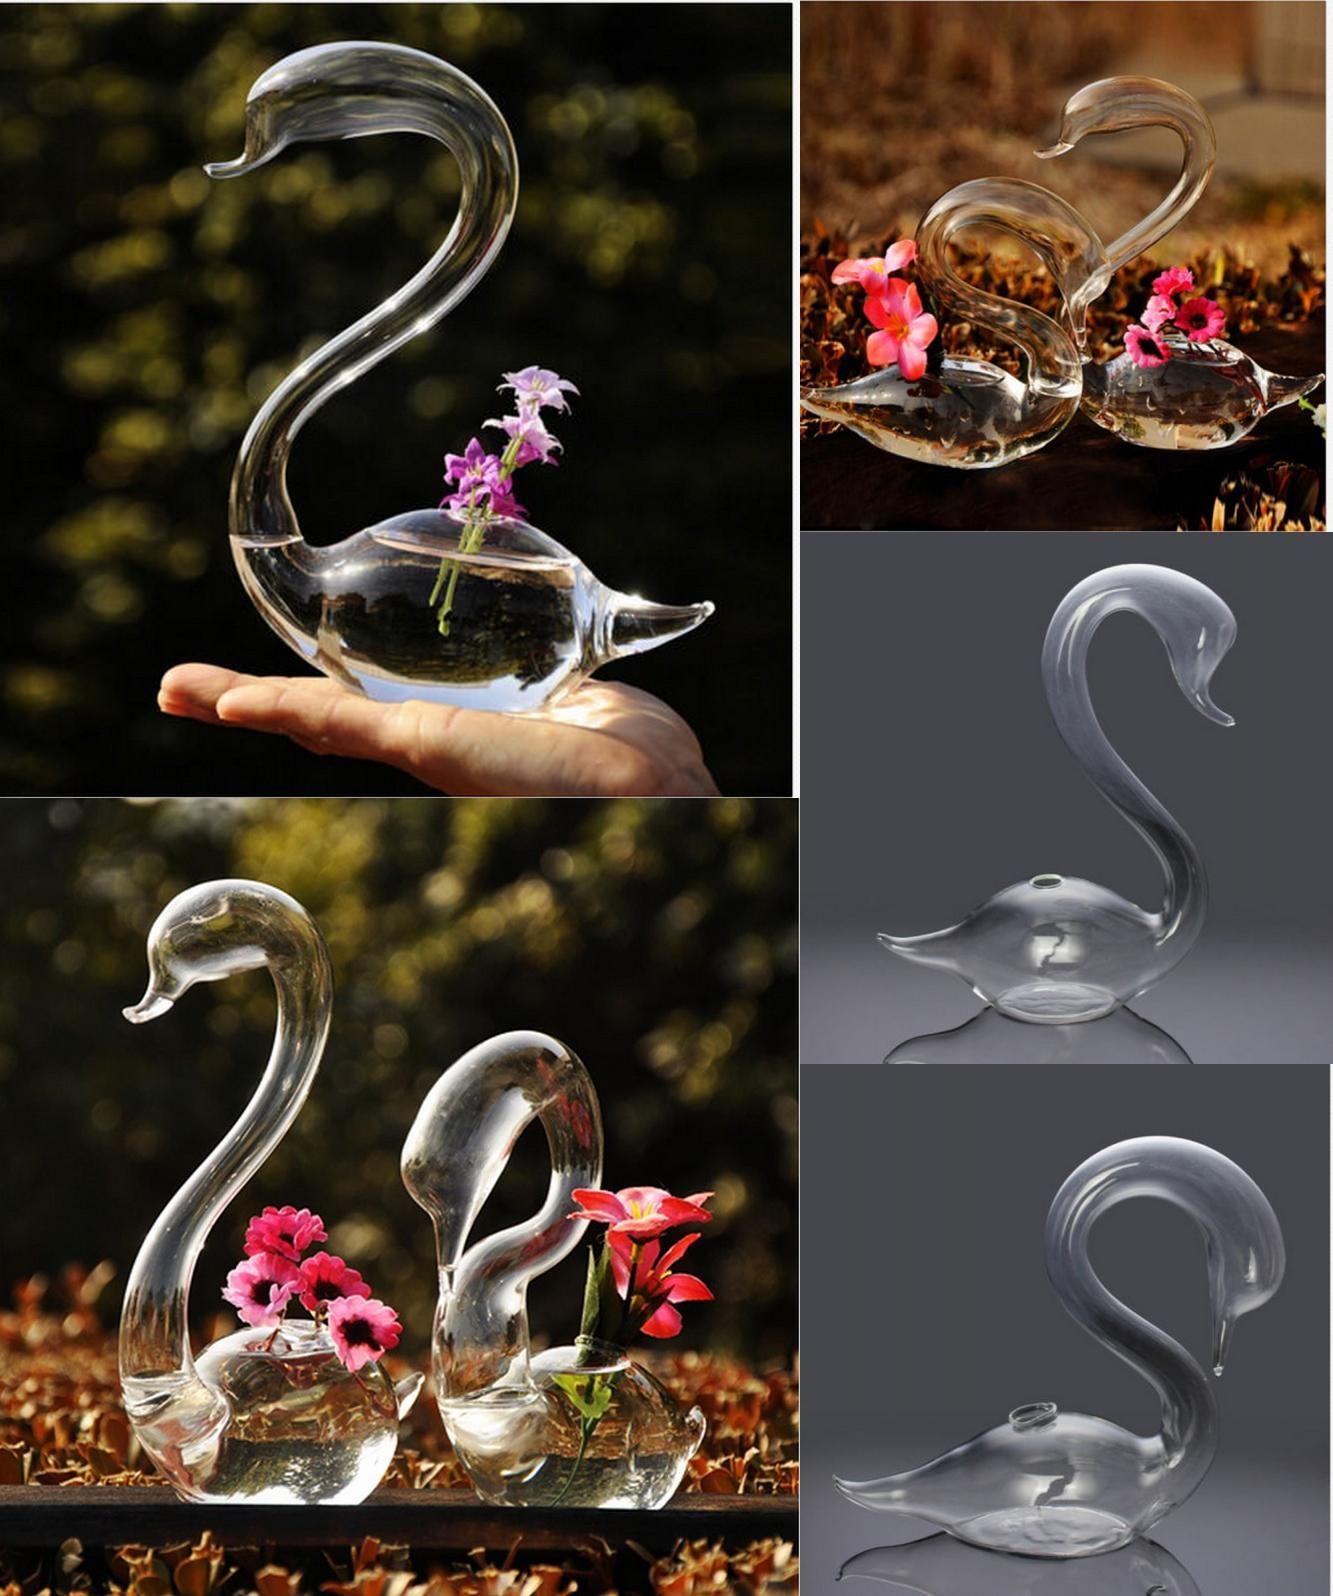 Visit to buy 2pcs loving swans flower watering plants glass vase visit to buy 2pcs loving swans flower watering plants glass vase home decor free floridaeventfo Choice Image